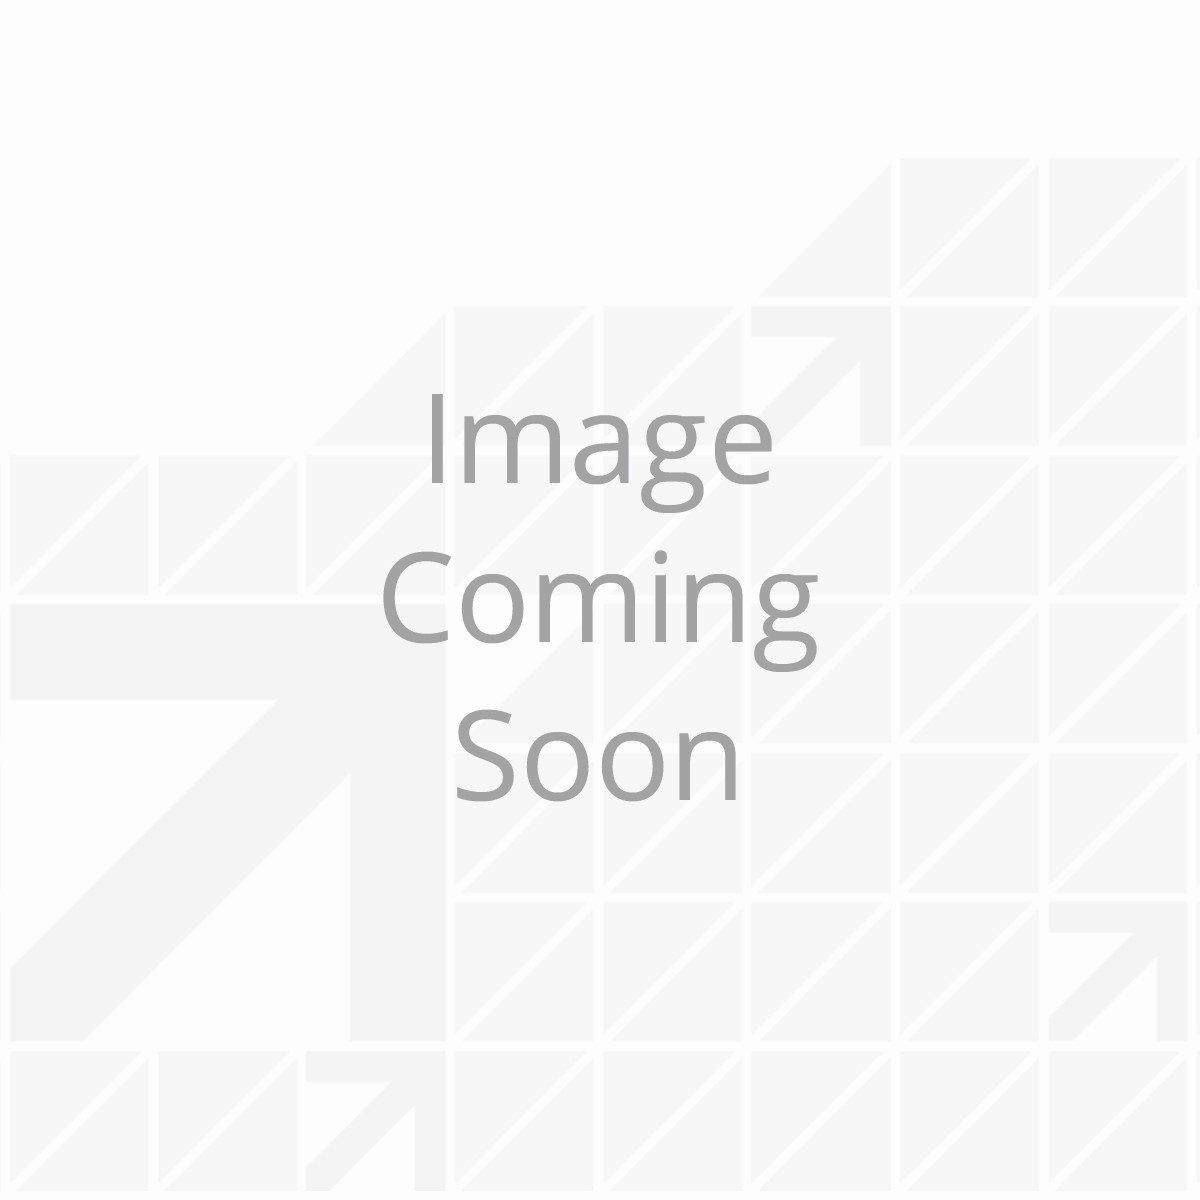 High Torque 500:1 Motor; Schwintek? In-Wall Slide-Out